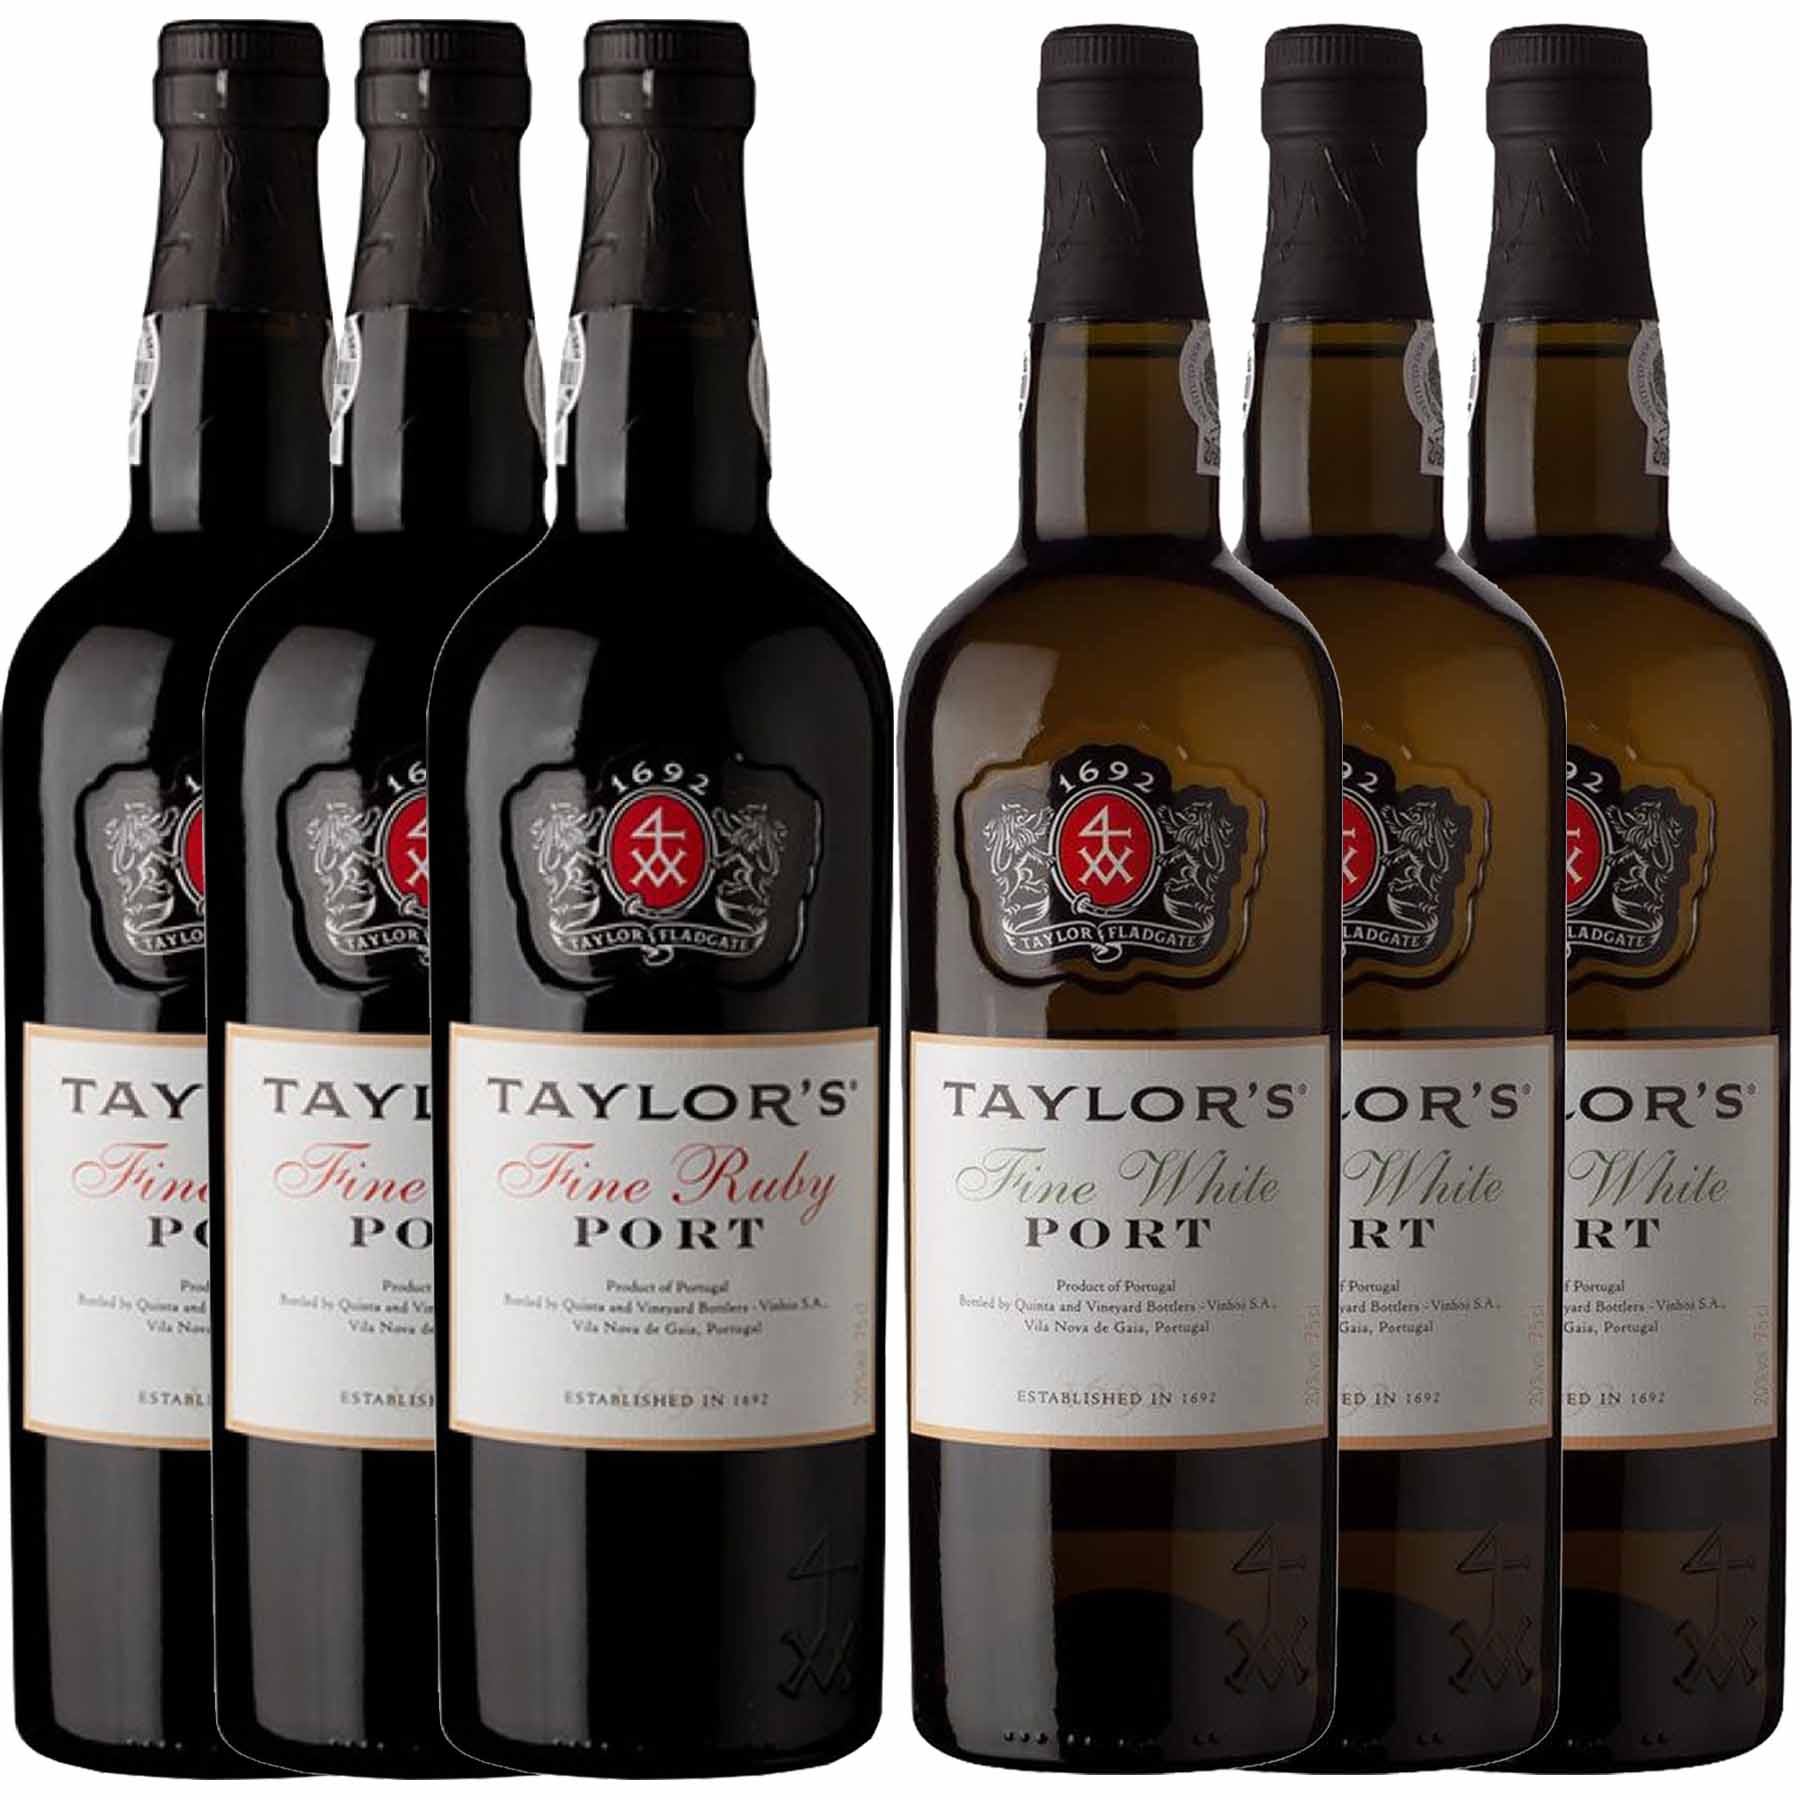 Kit 6x Vinho do Porto Taylor's White Fine + Tawny 750ml